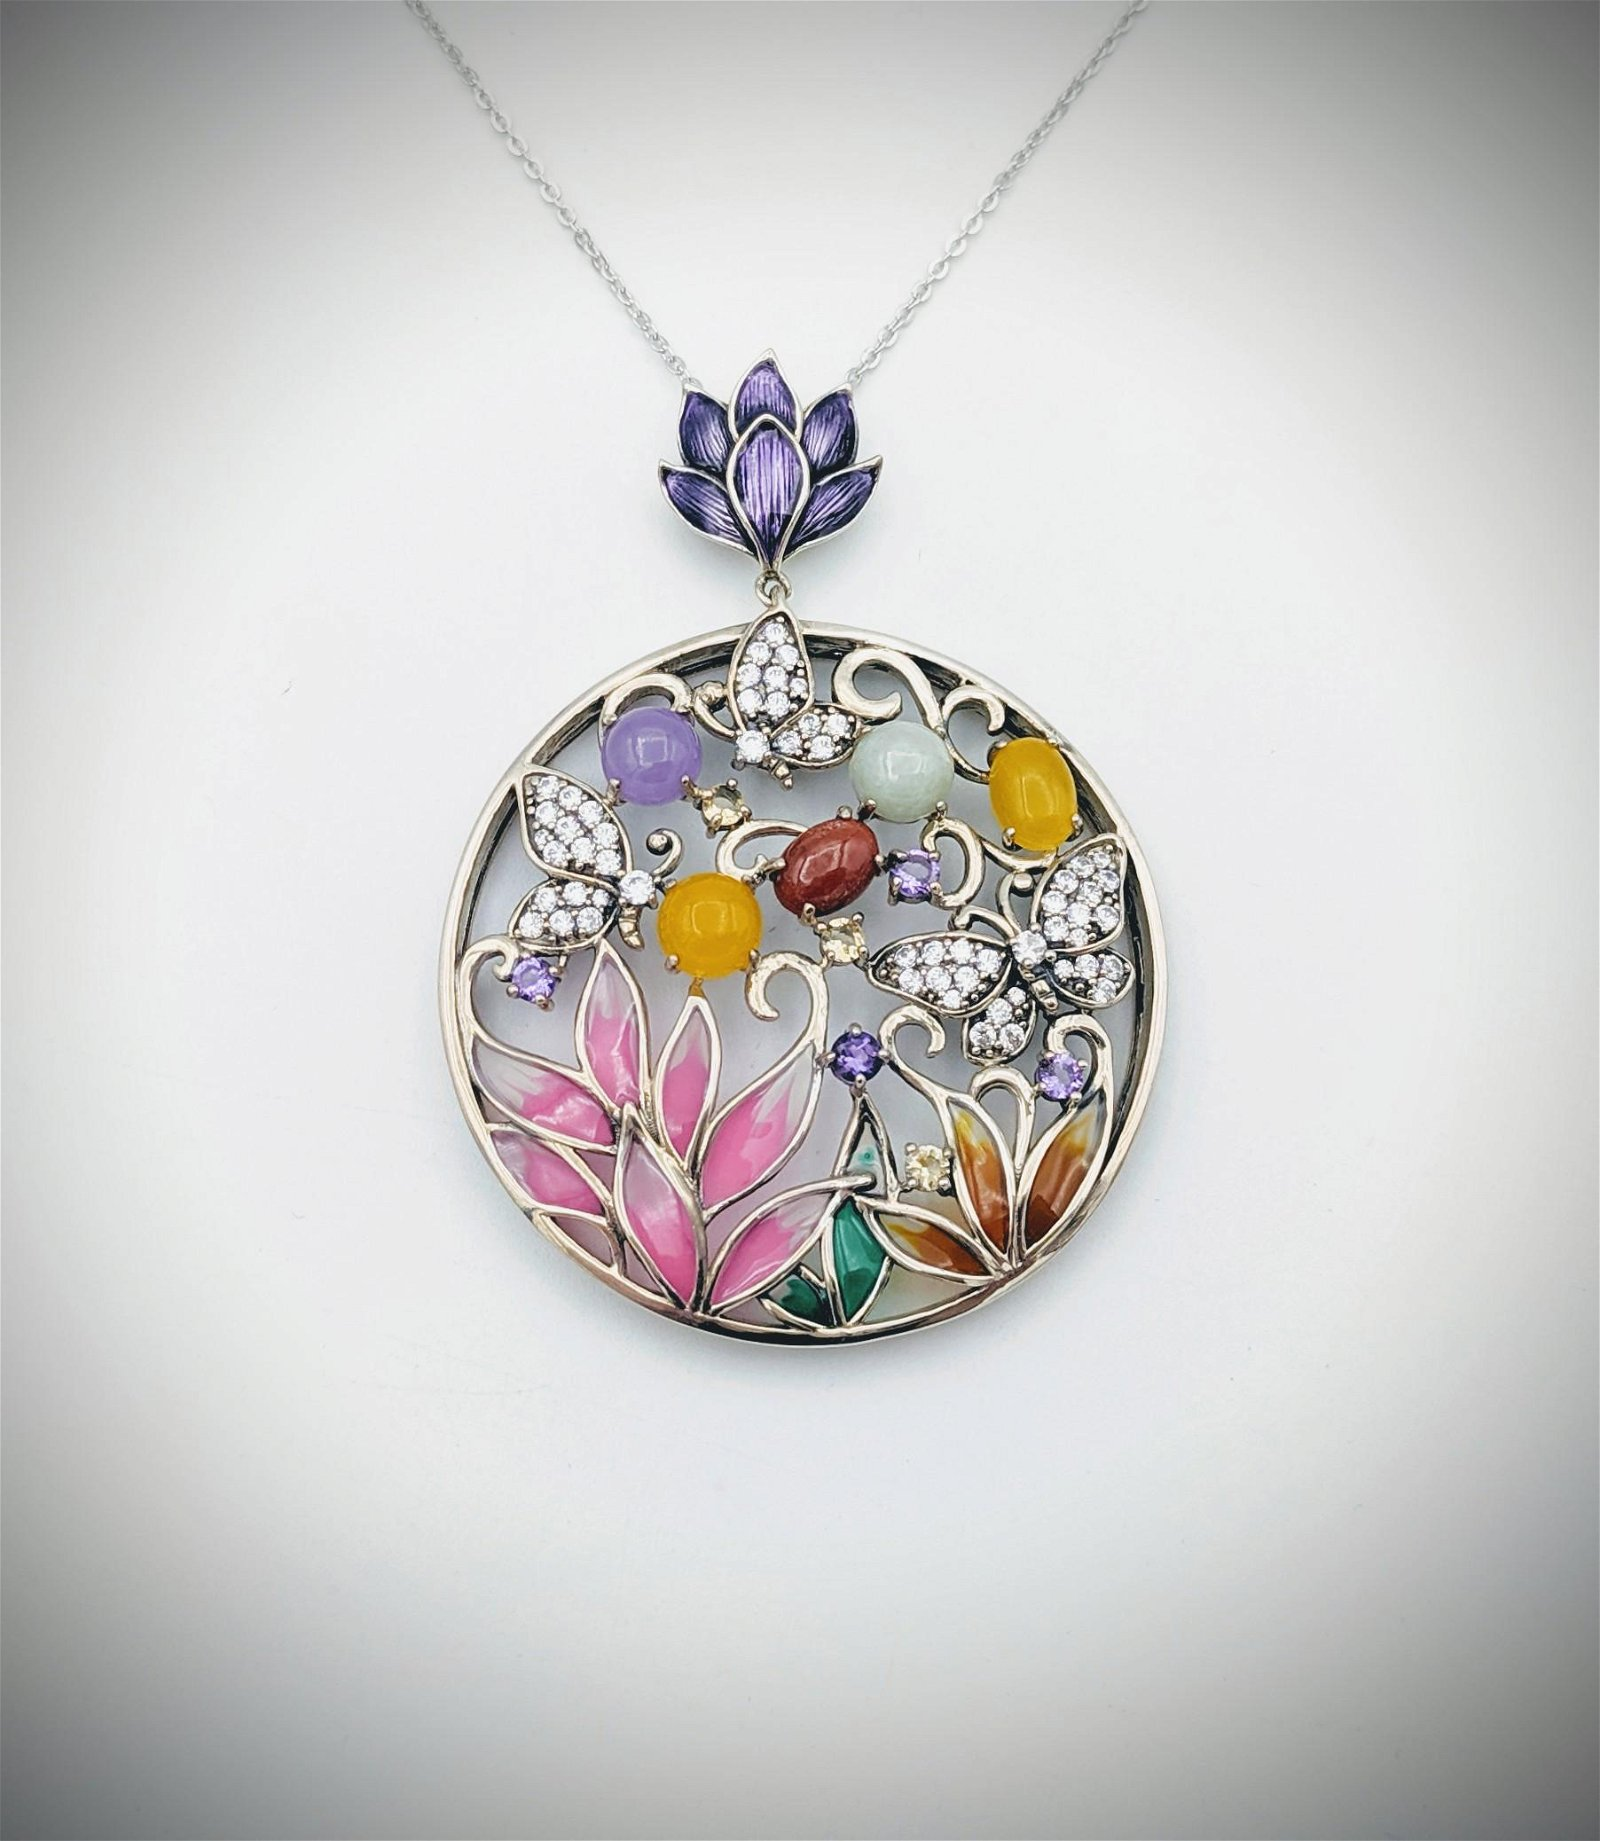 Necklace & Butterfly Pendant w Multicolored Enamaling,